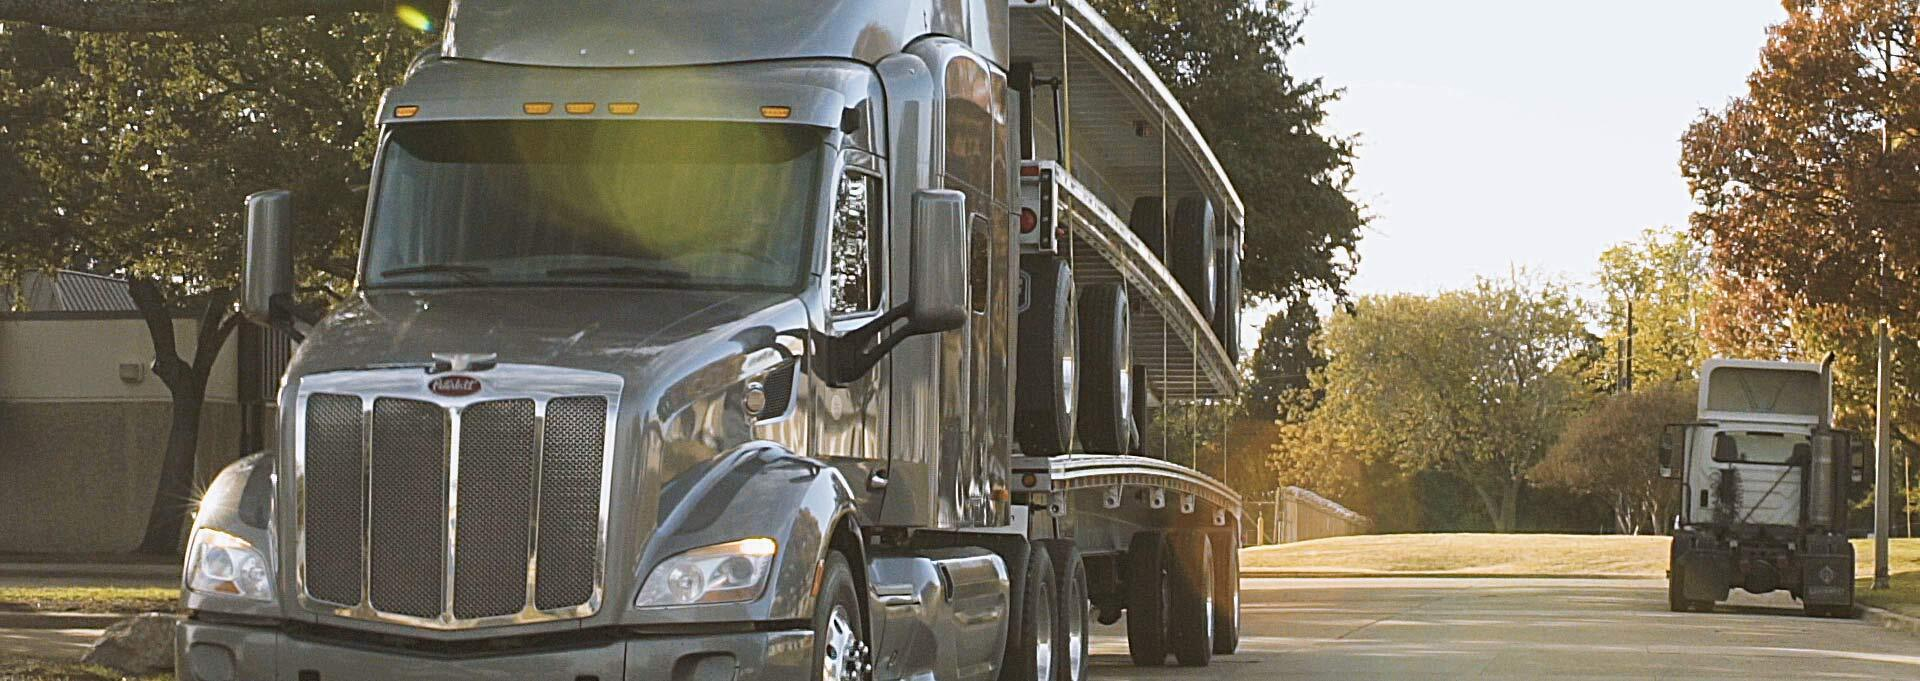 Patriot Truck Sales Dallas Tx >> Used Vehicle Dealership Dallas Tx Patriot Truck Sales